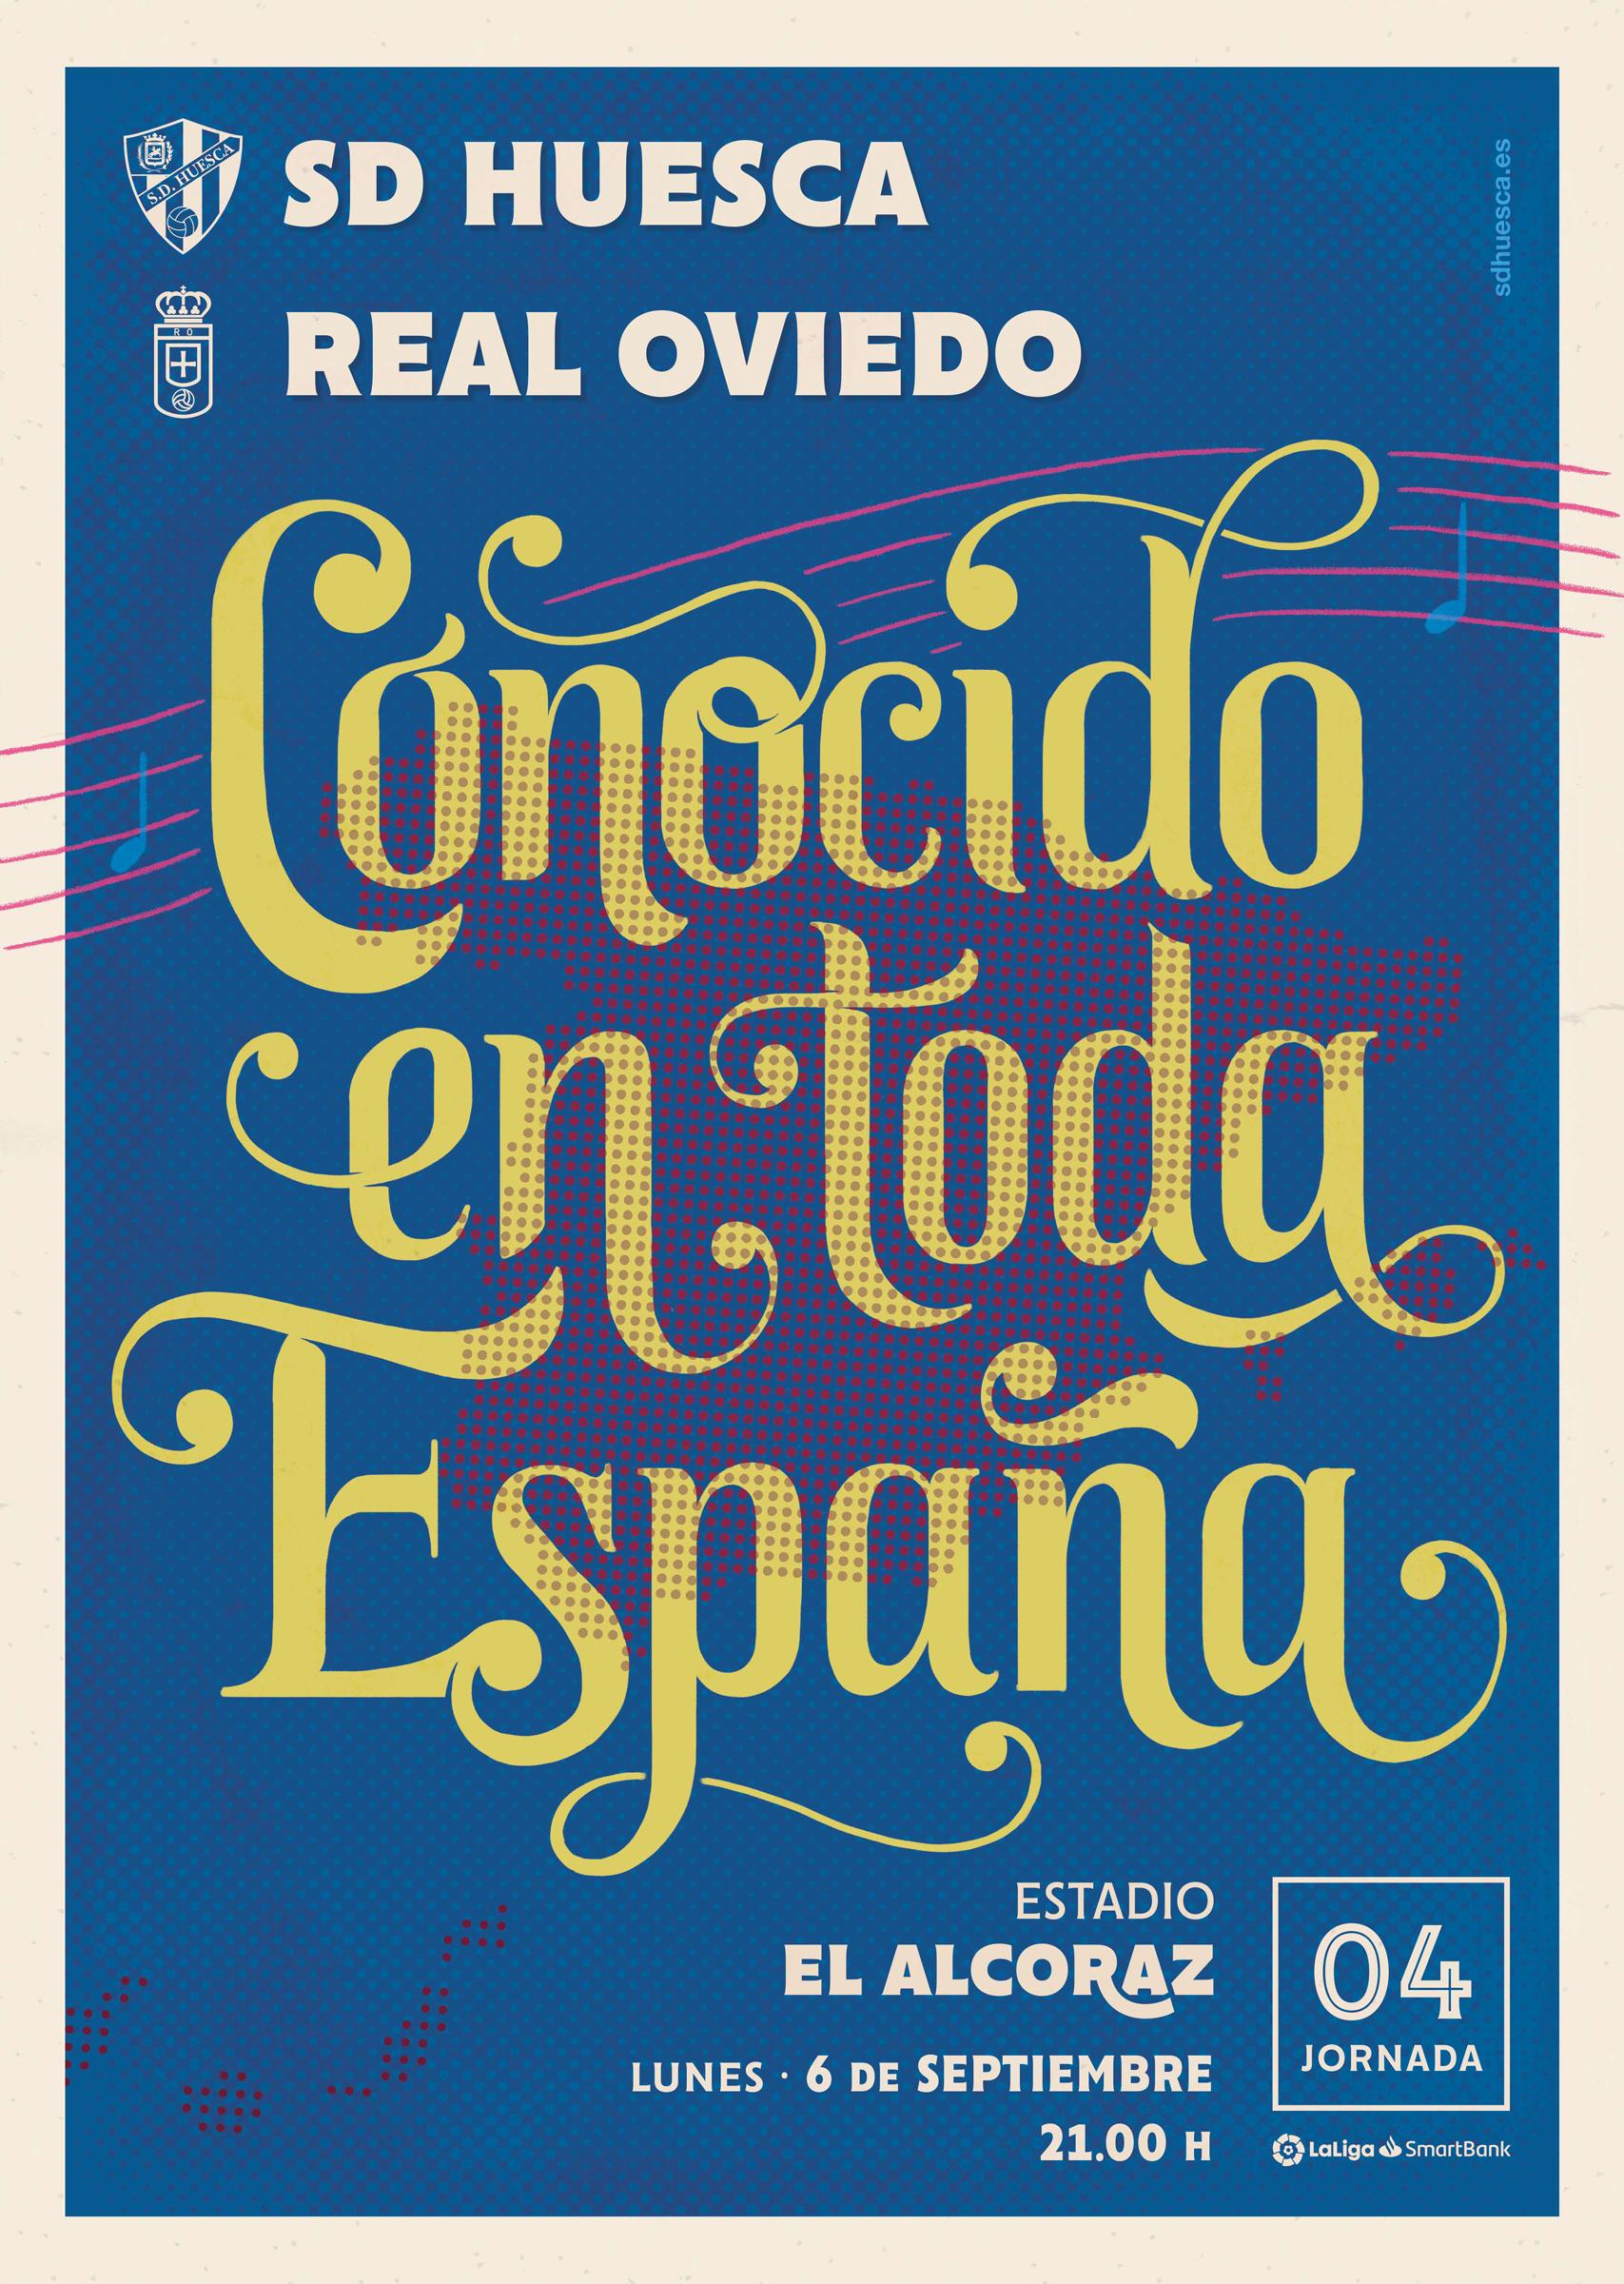 J4: SD Huesca - Real Oviedo